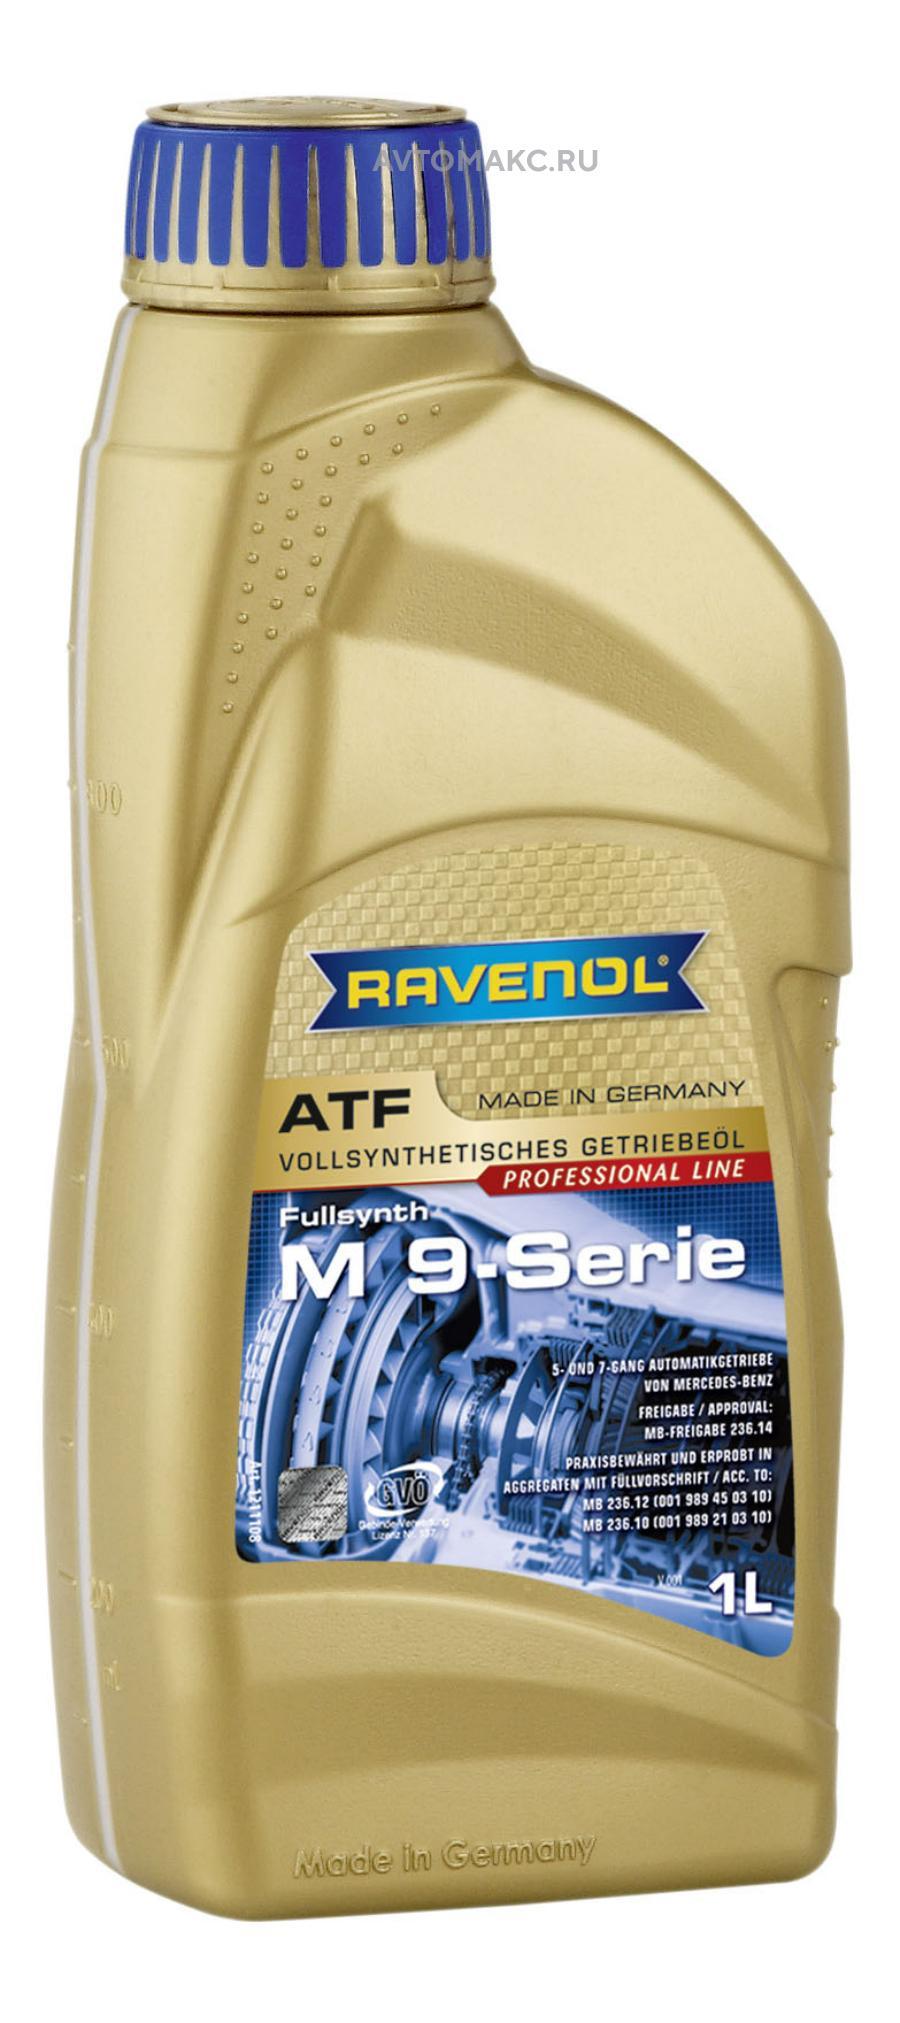 Трансмиссионное масло ravenol atf mb 9-serie ( 1л) new